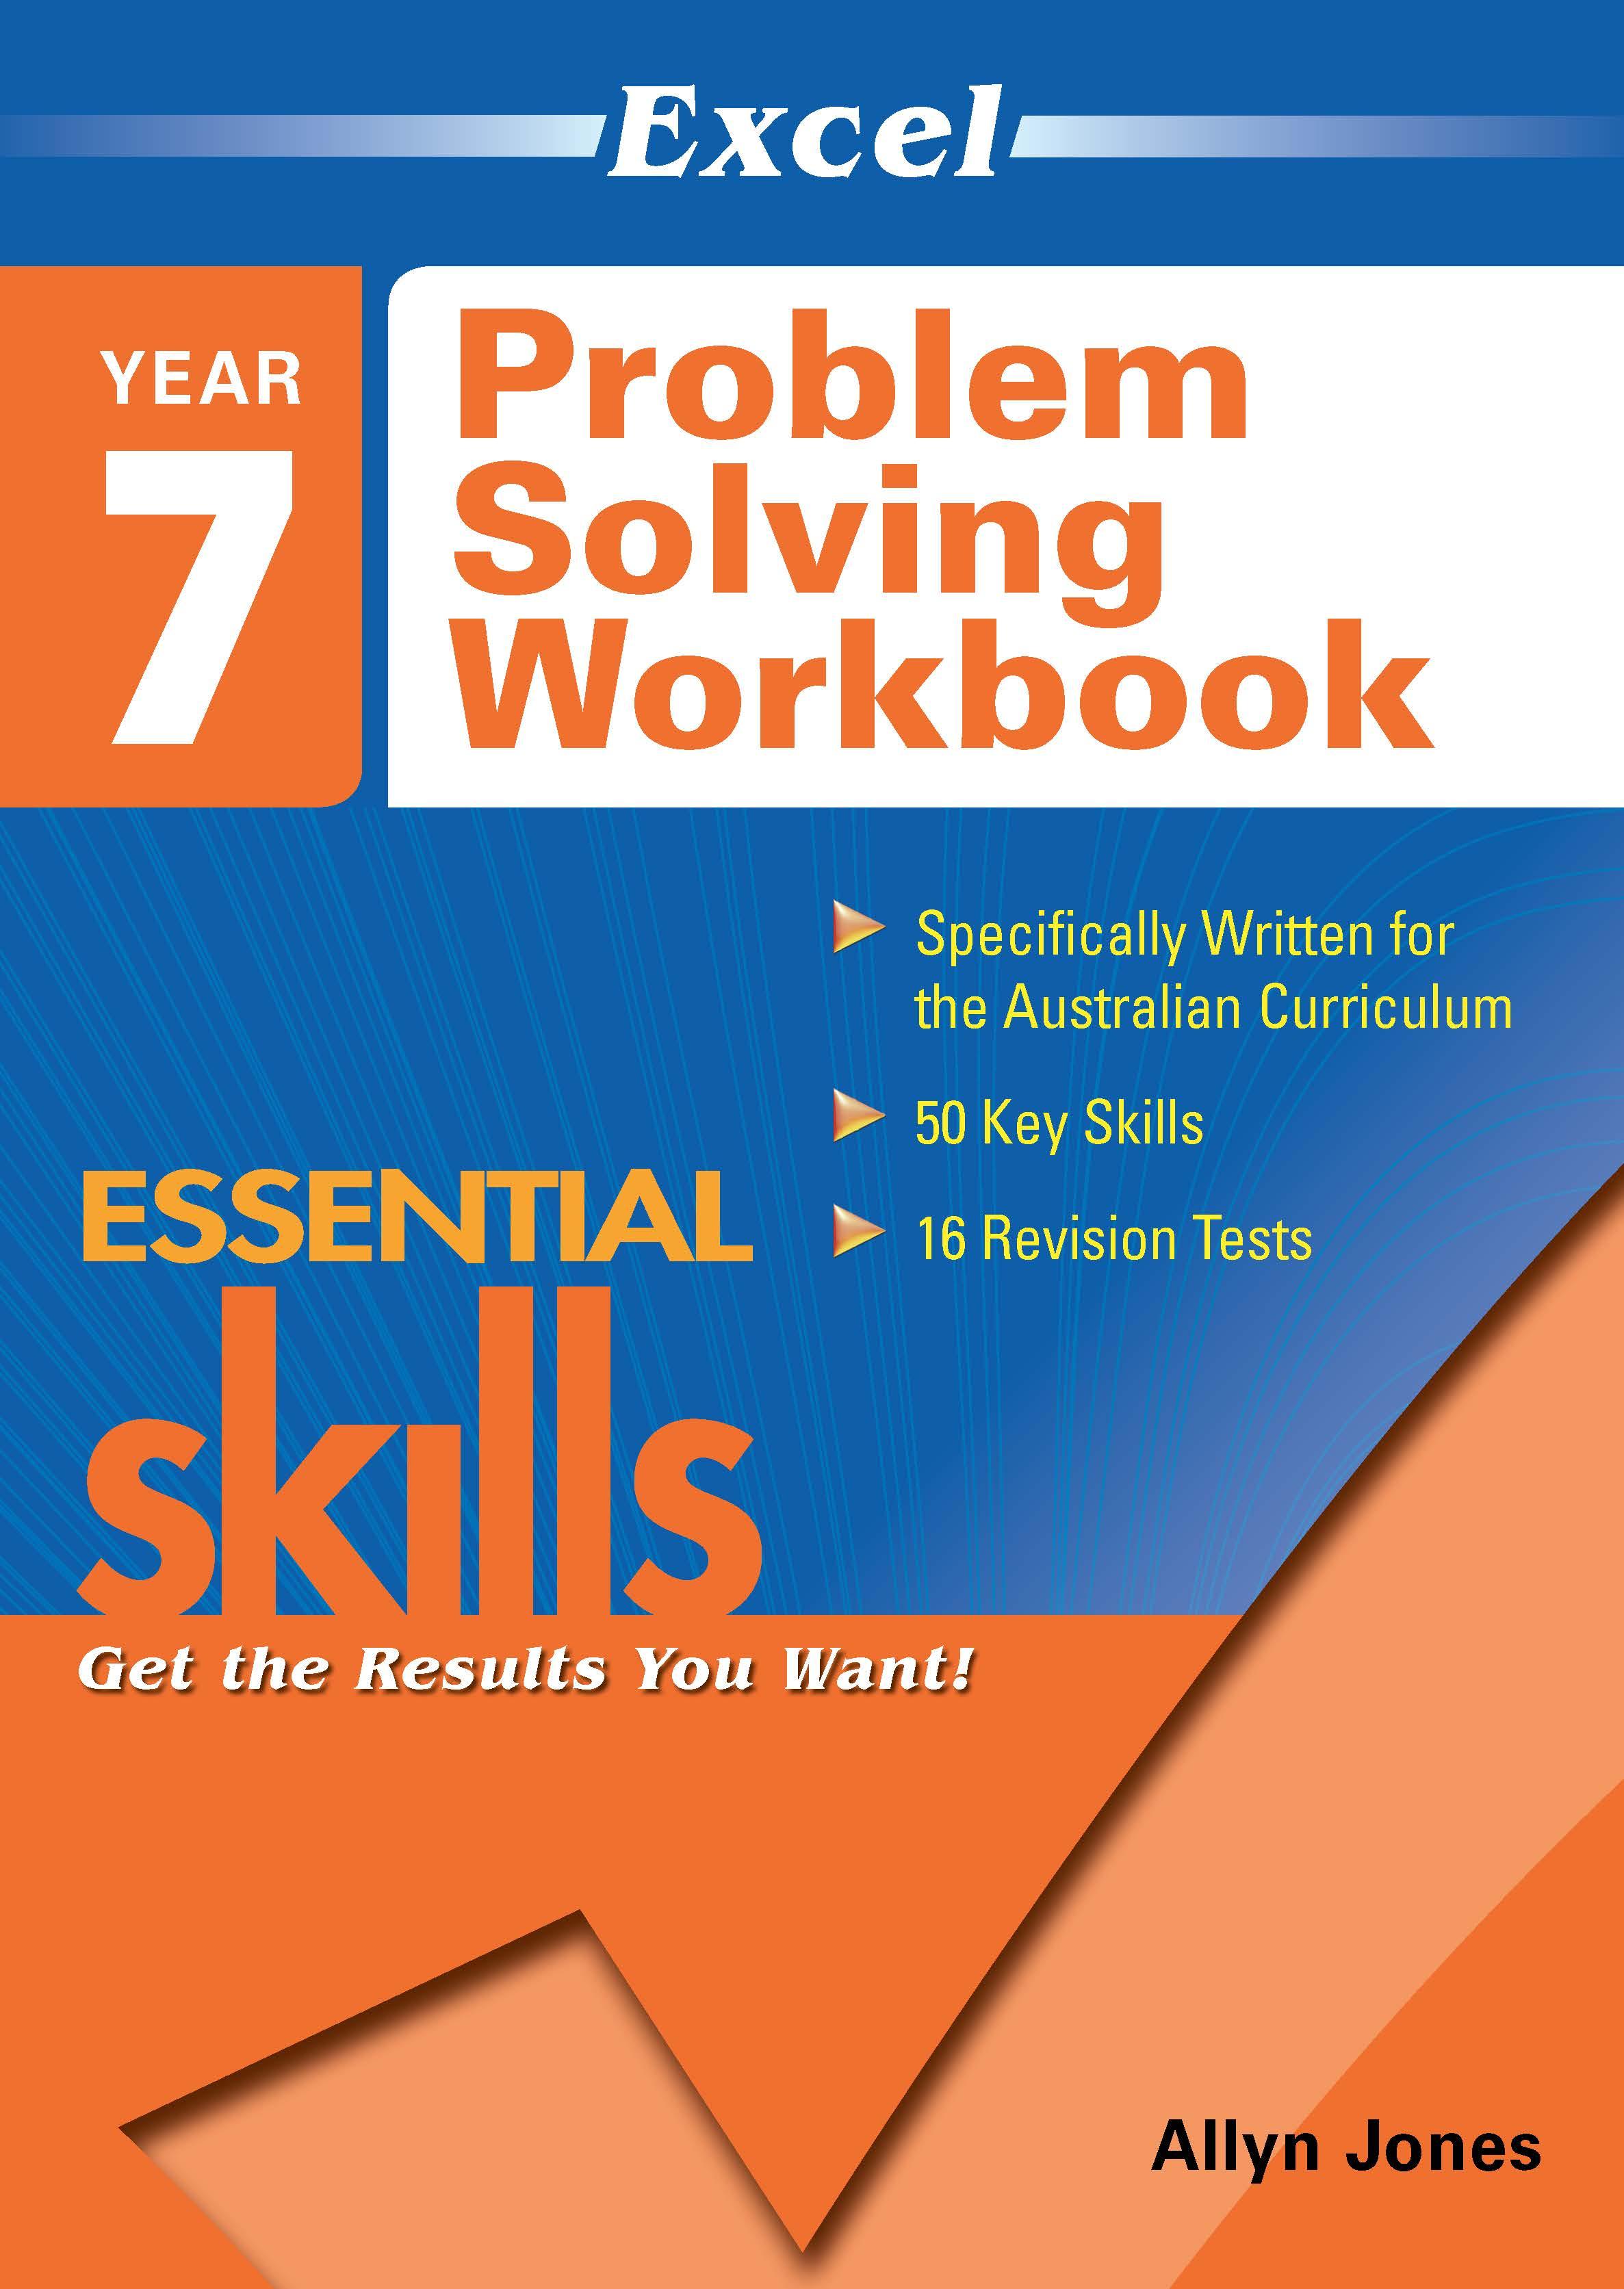 Excel Essential Skills: Problem Solving Workbook Year 7